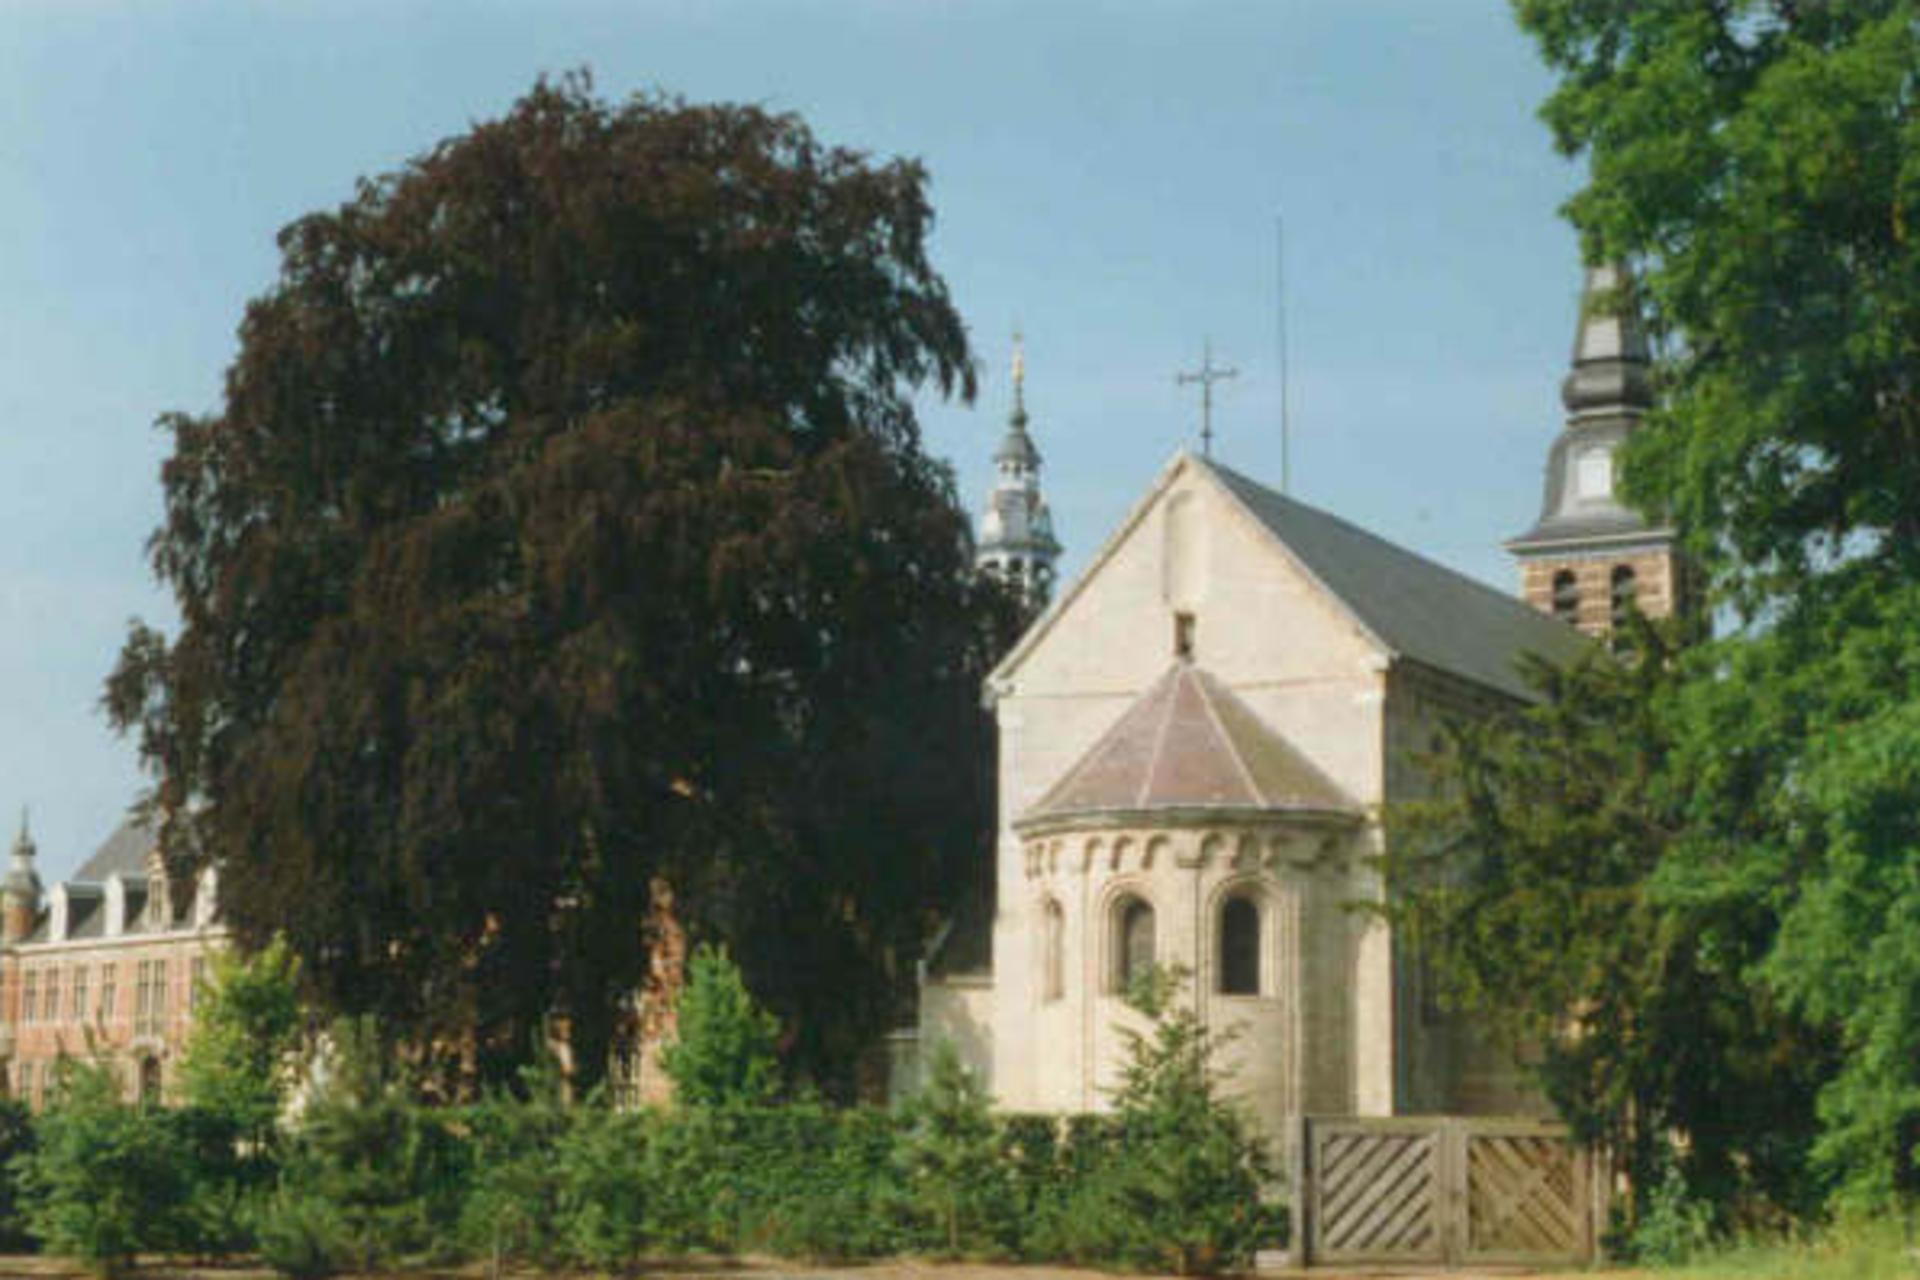 Postel Abbey